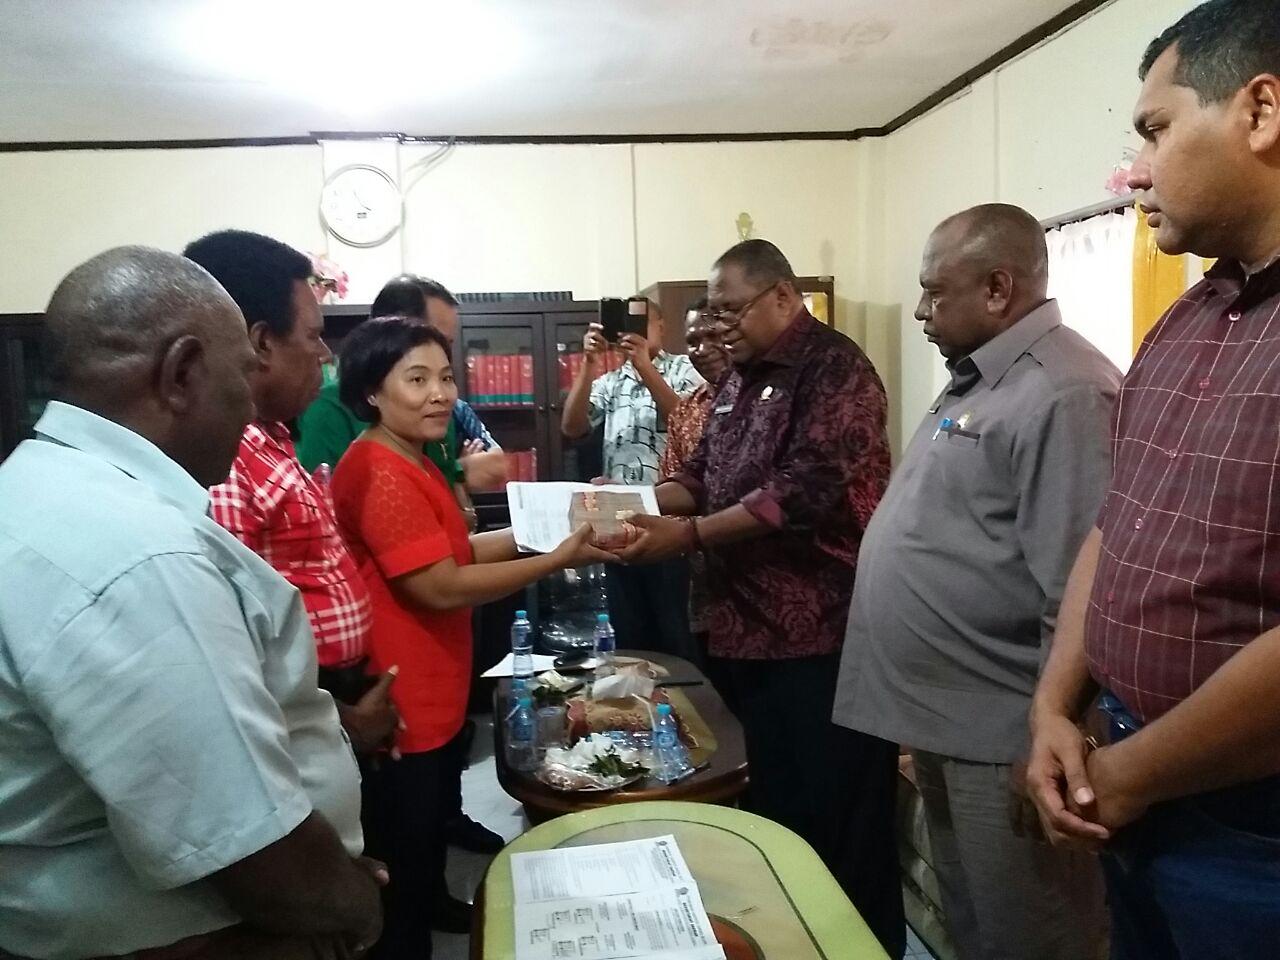 Bupati Sorong Selatan, Syamsudin Anggiluli, SE menyerahkan uang kepada kuasa hukum Marga Anni, Dina Lalar Butarbutar di ruang Ketua Pengadilan Negeri kelas Ib Sorong